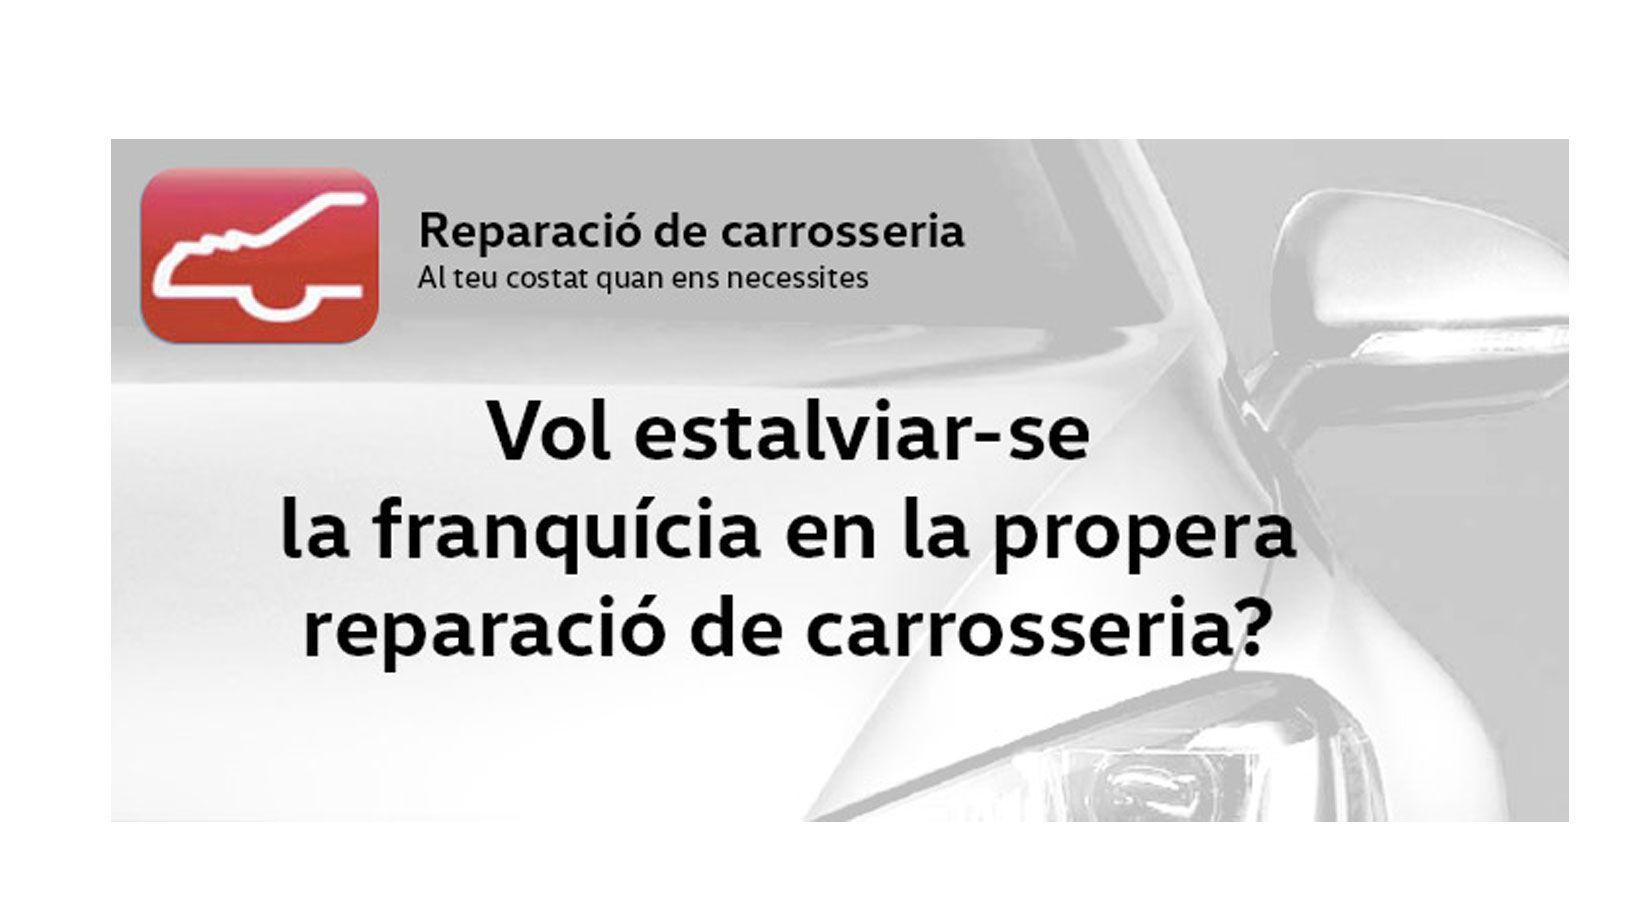 Traiga su coche a Reusmòbil i la franquicia le puede salir gratis.